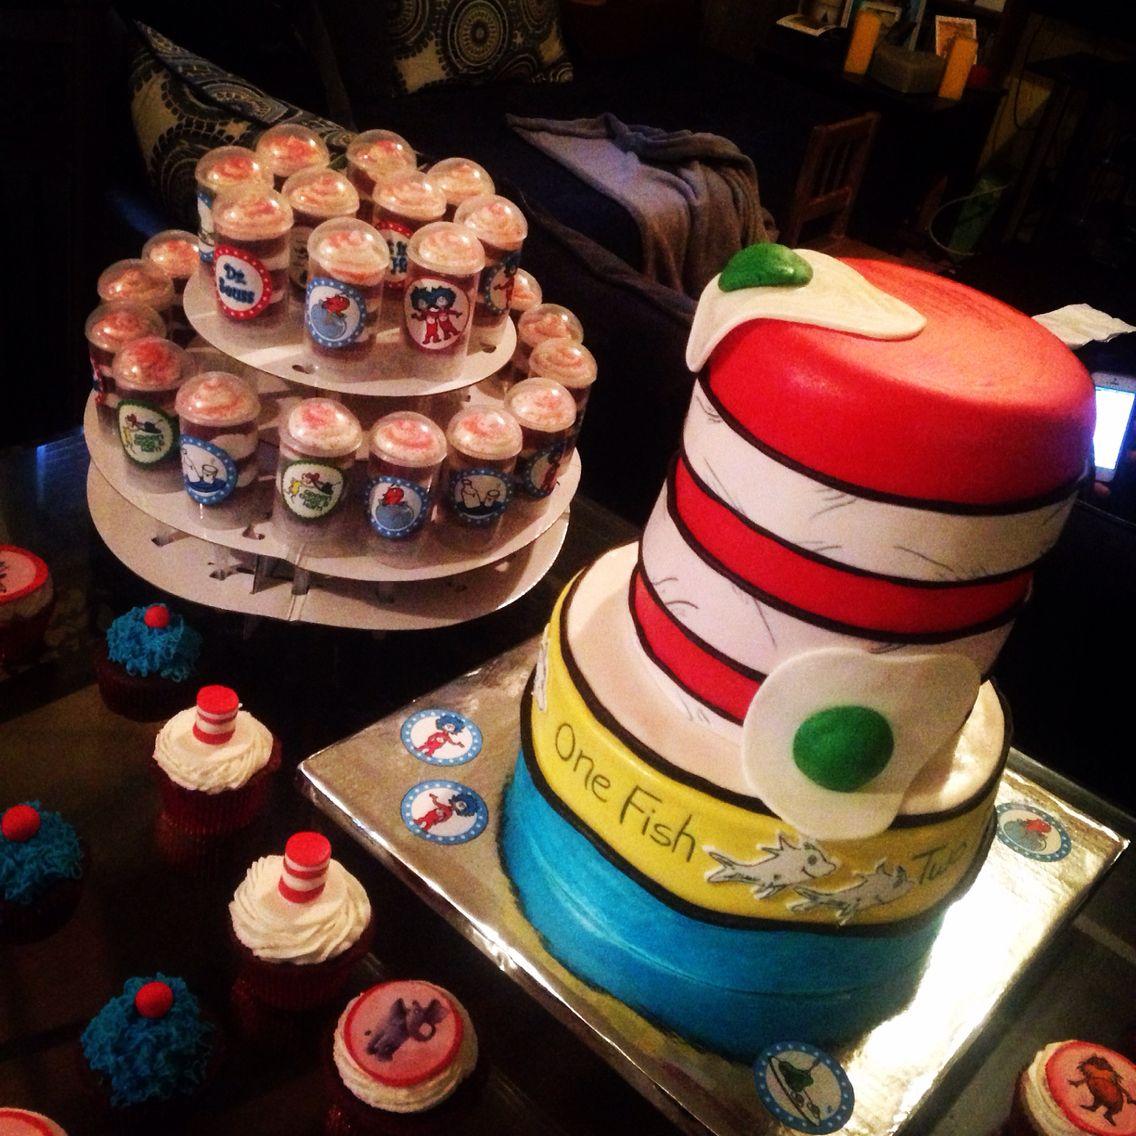 Dr seuss cat in the hat babyshower cake dr seuss cake